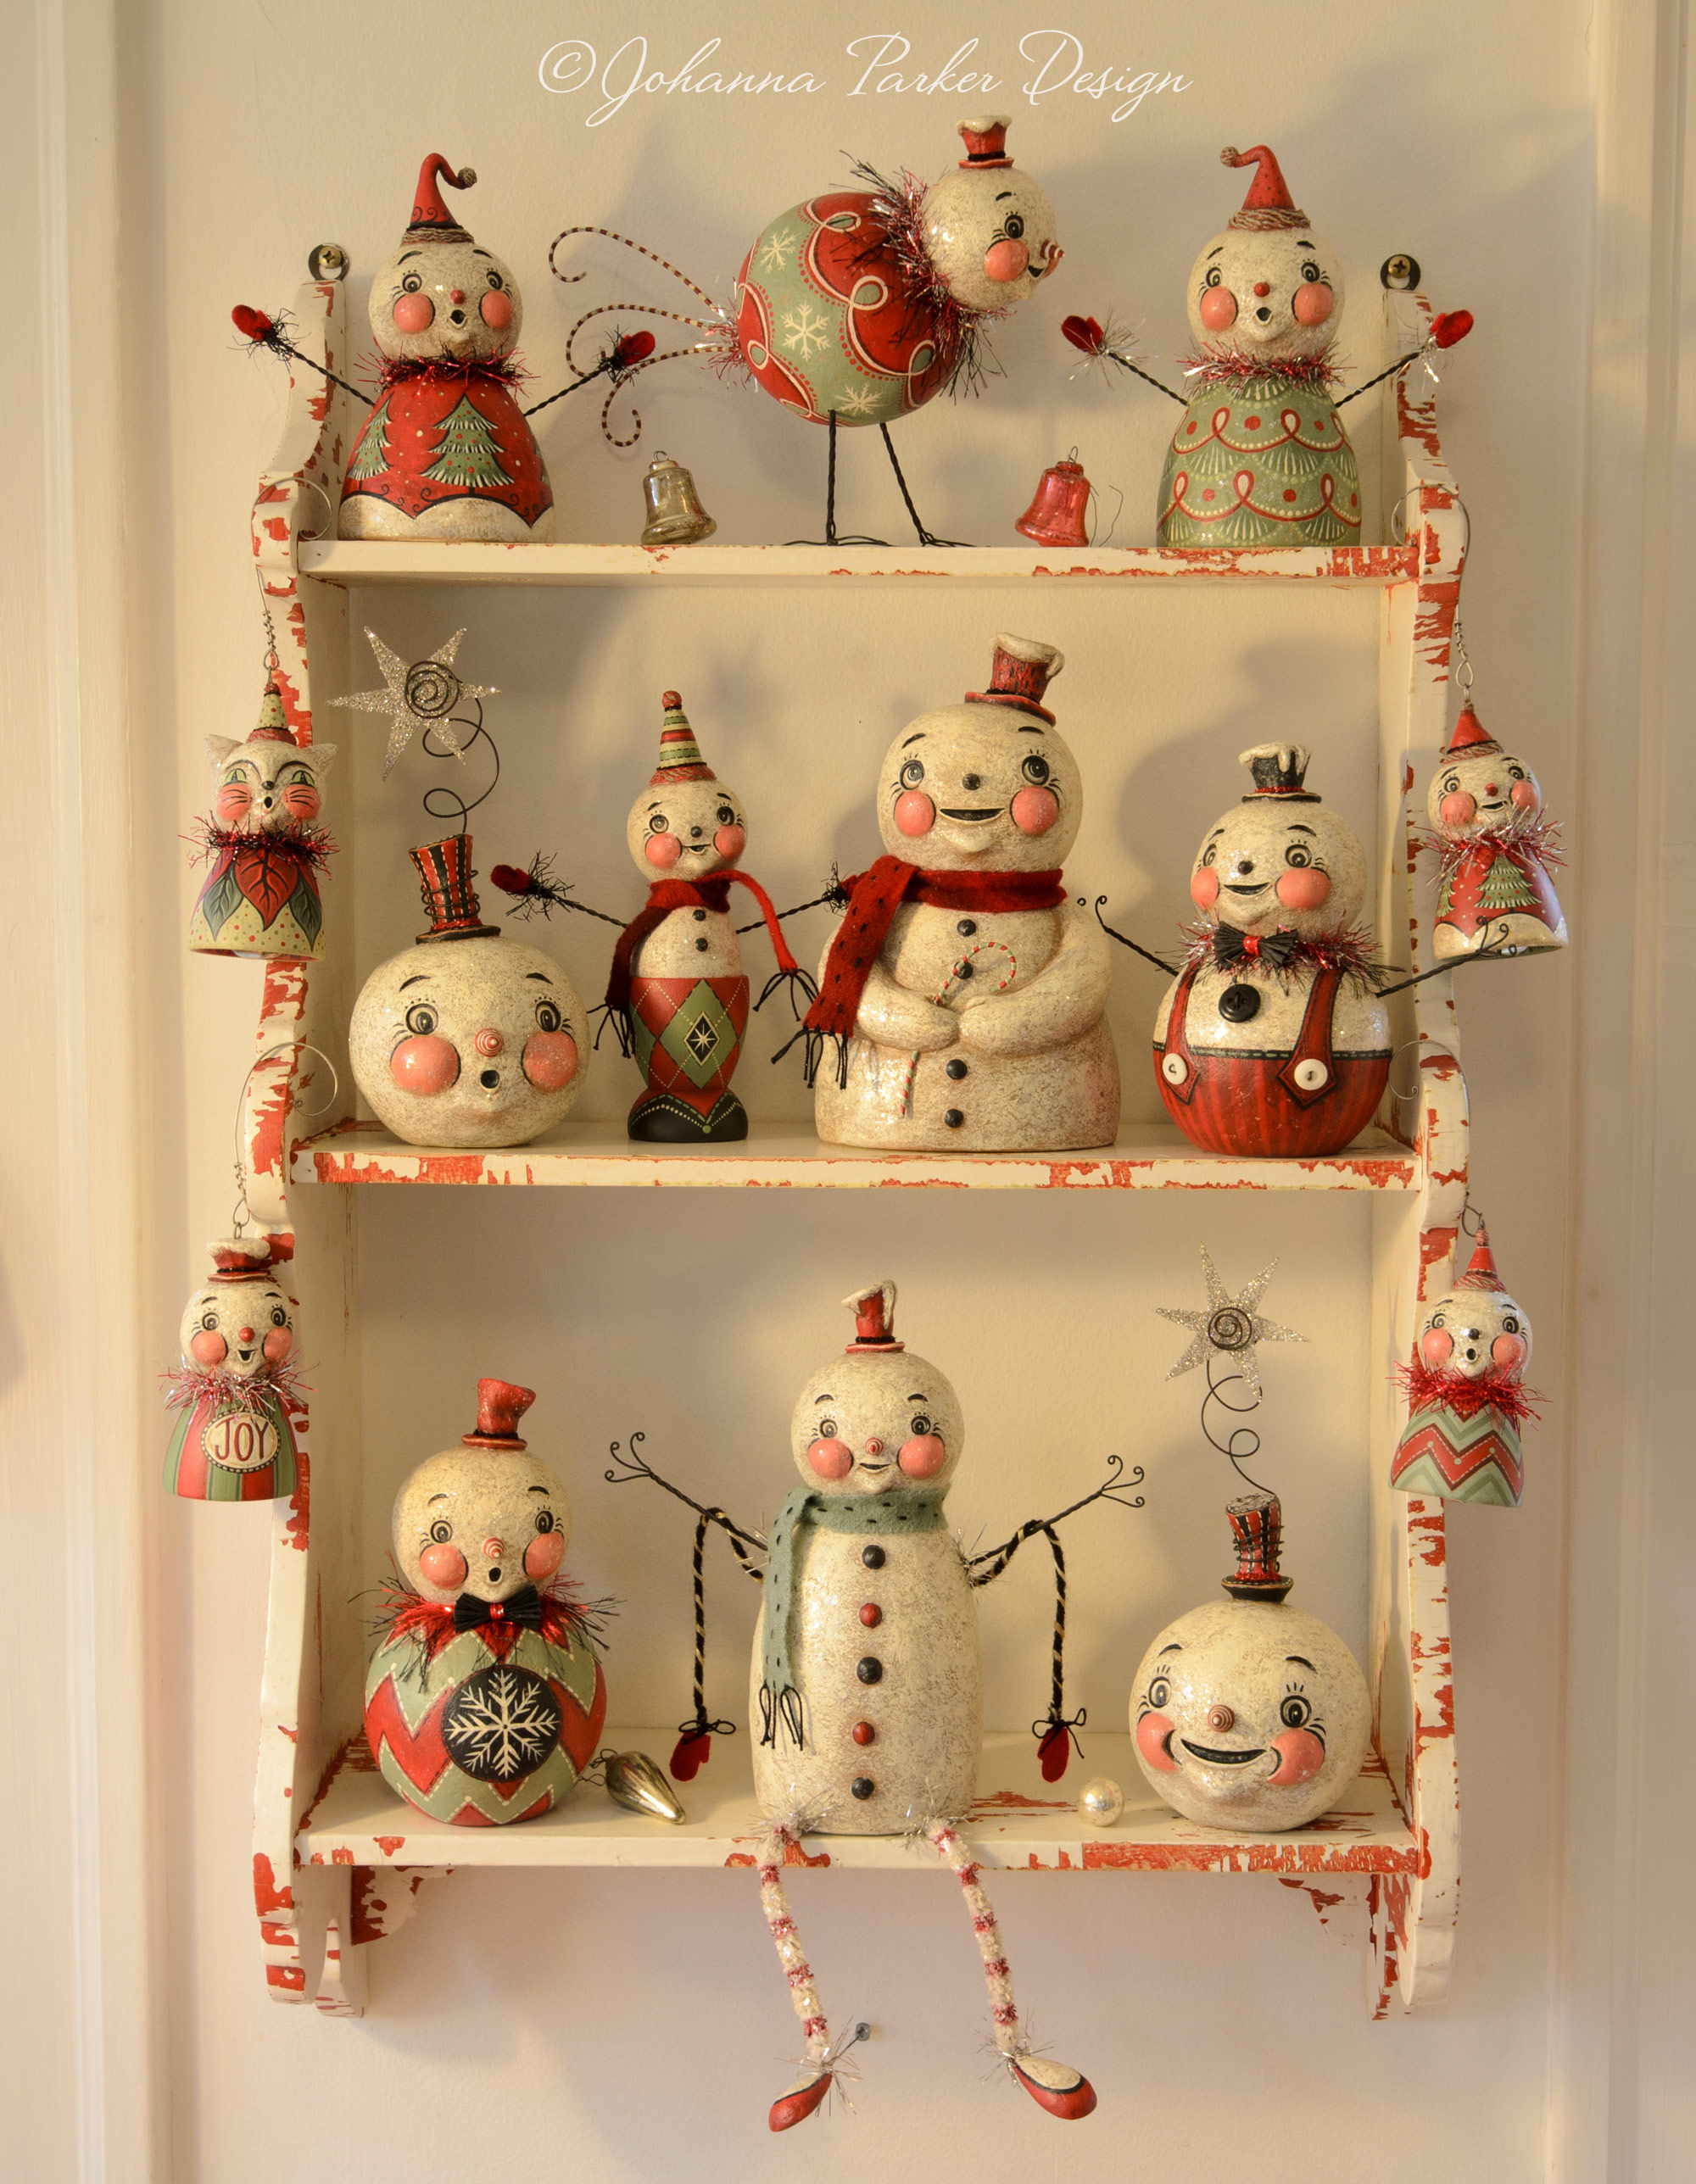 Holiday folk art shelf collection